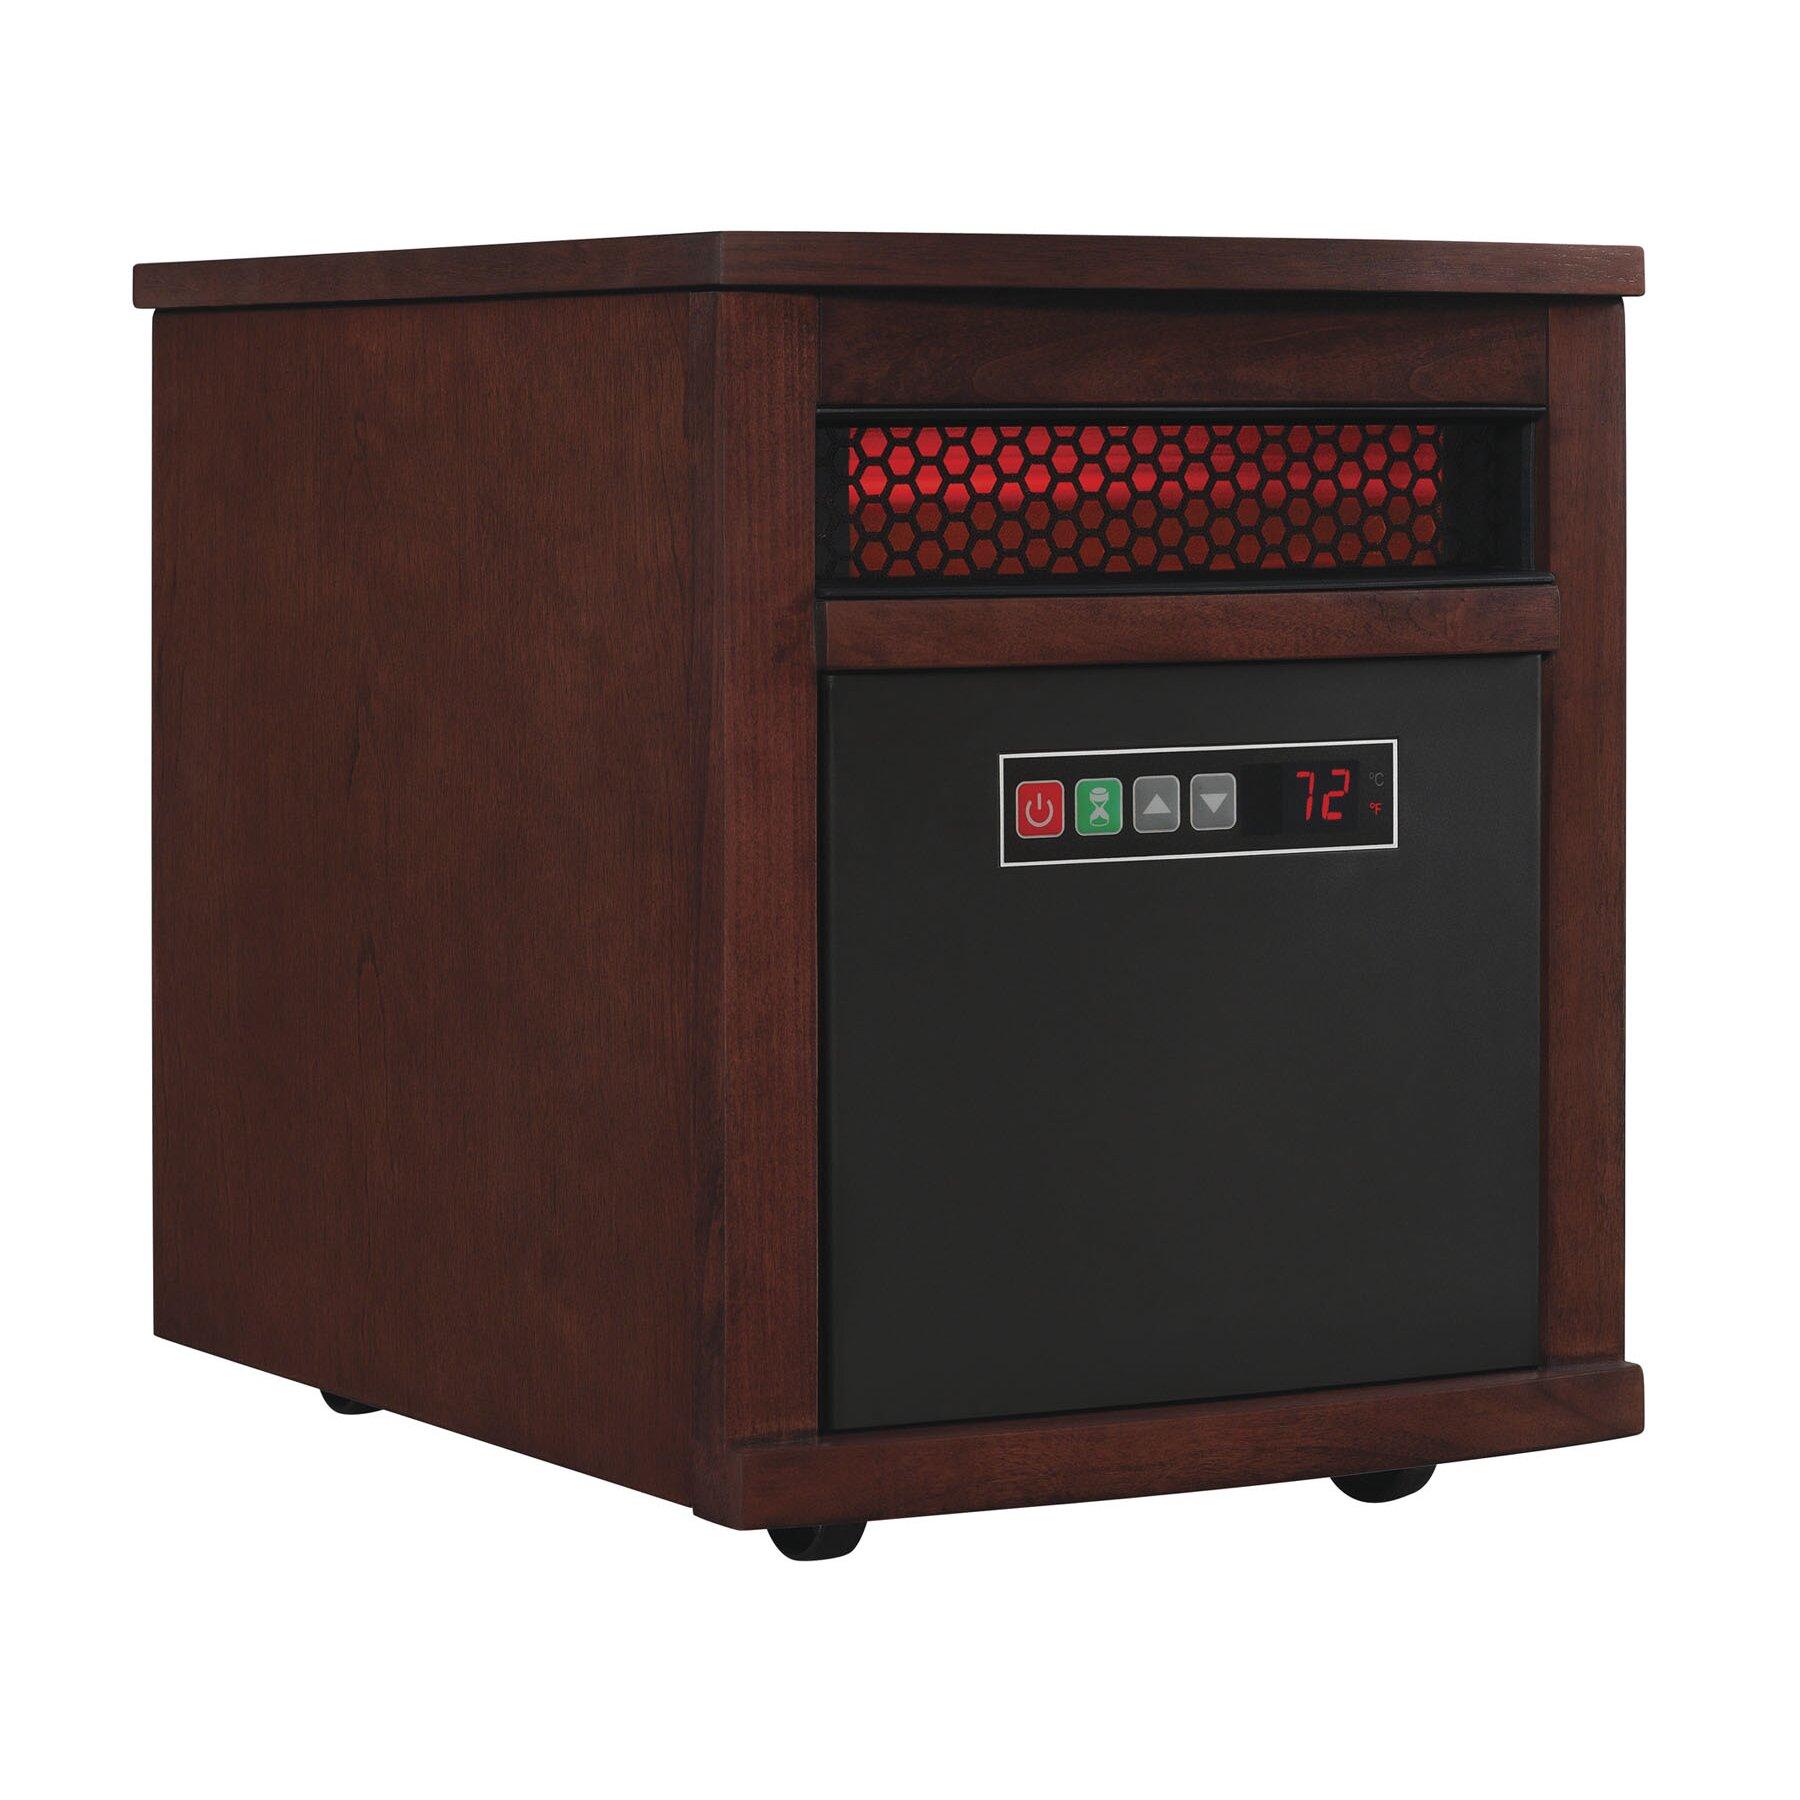 Heating & Cooling  Electric Space Heaters Duraflame SKU: DFL1046